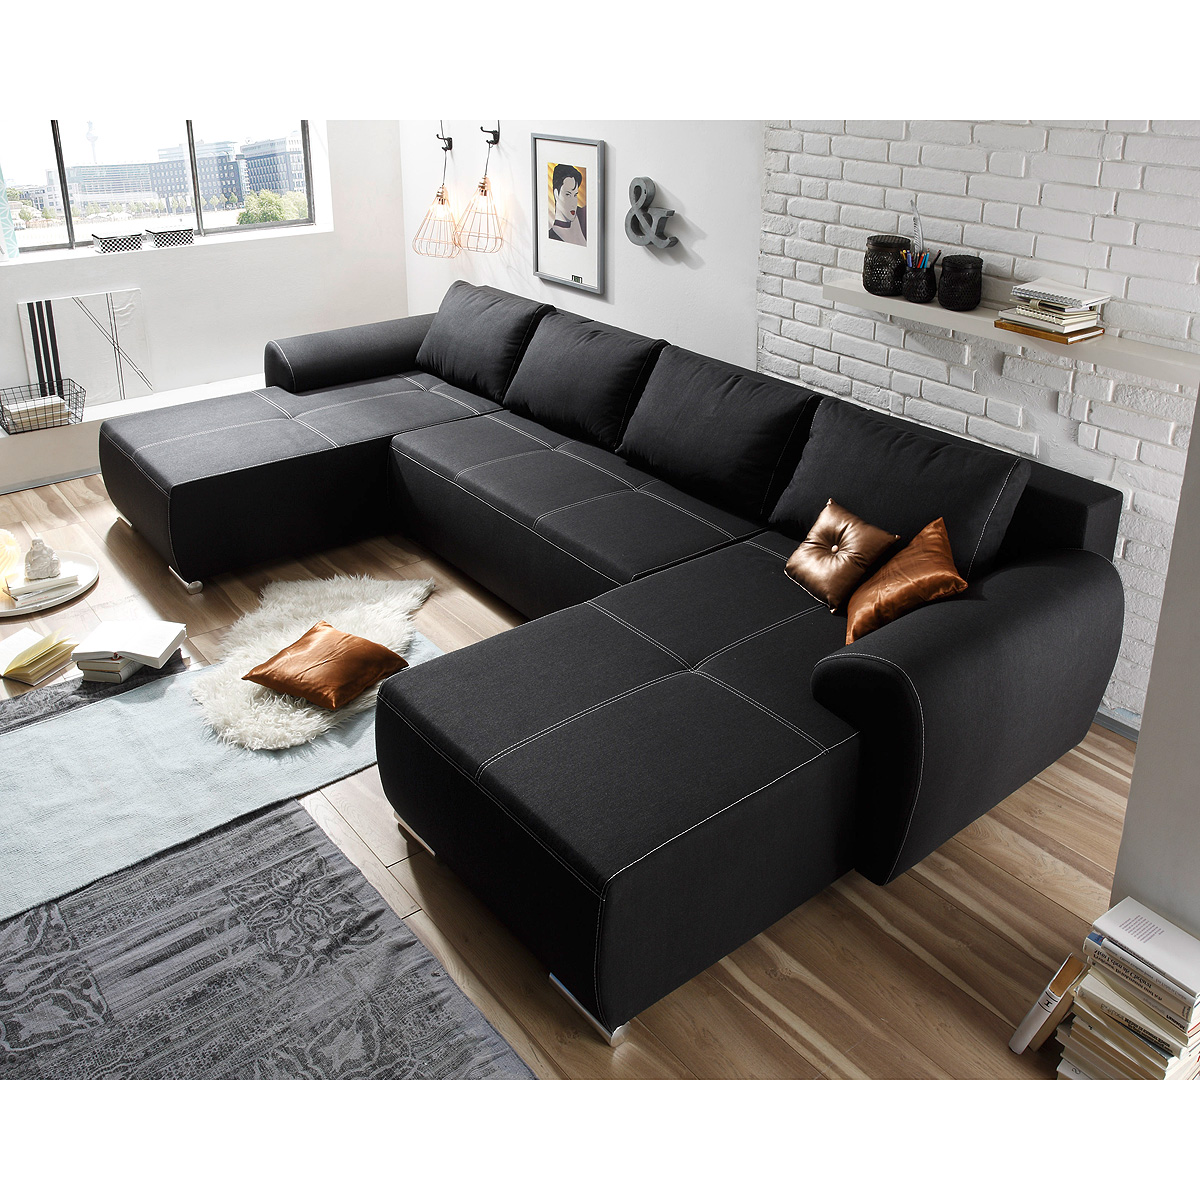 edle schlafcouch polster sofa ecksofa wohnlandschaft bettfunktion sofas couch ebay. Black Bedroom Furniture Sets. Home Design Ideas